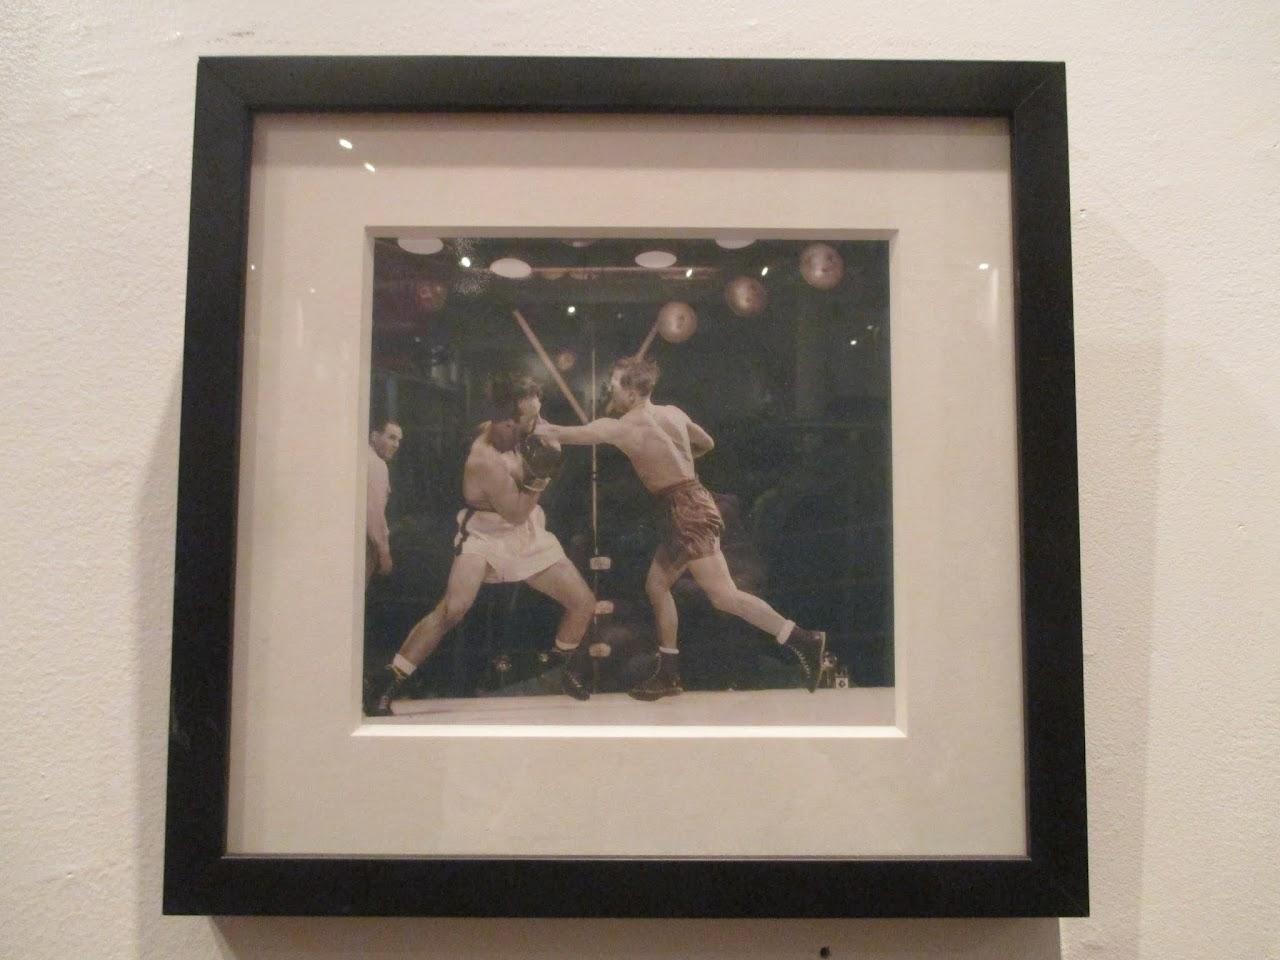 Boxing Photograph